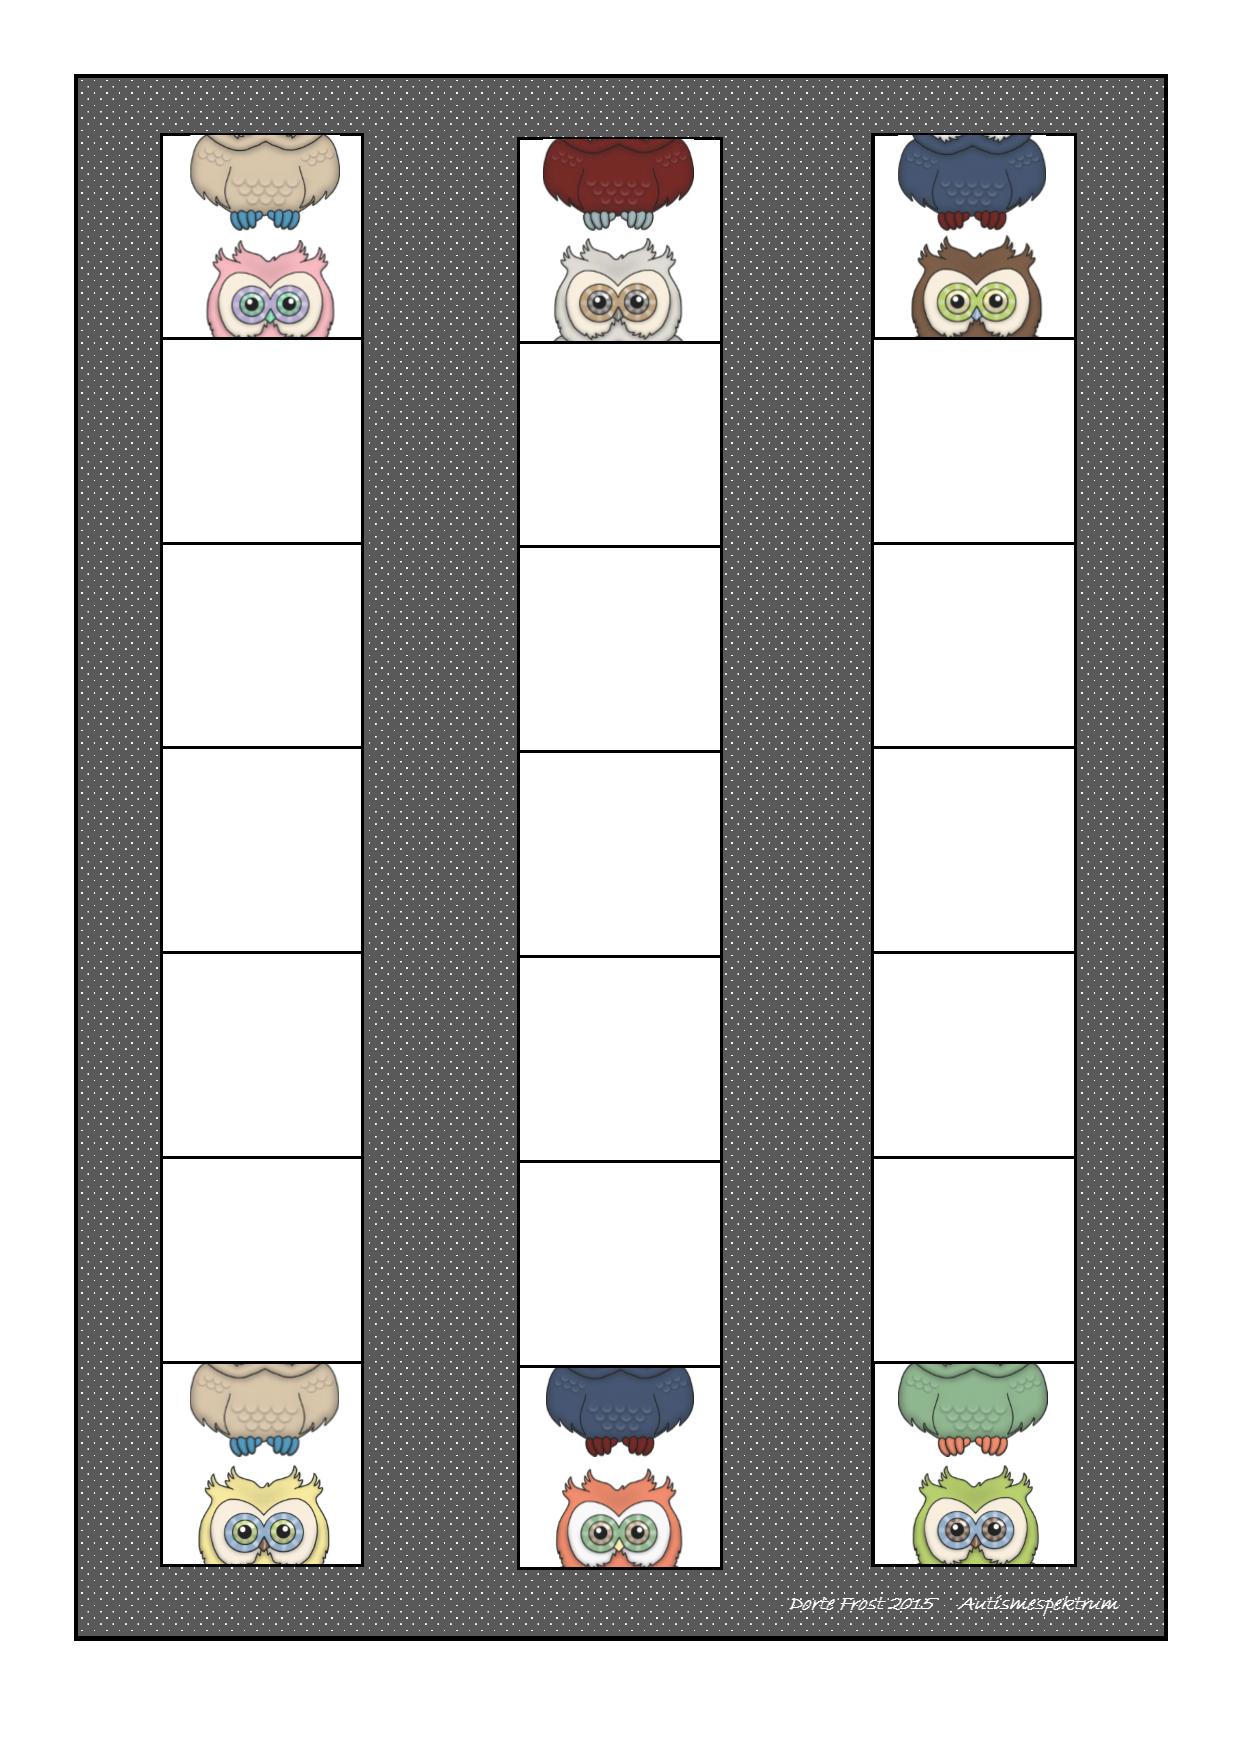 Board for the Domino game. Find the belonging tiles on Autismespektrum on Pinterest. By Autismespektrum